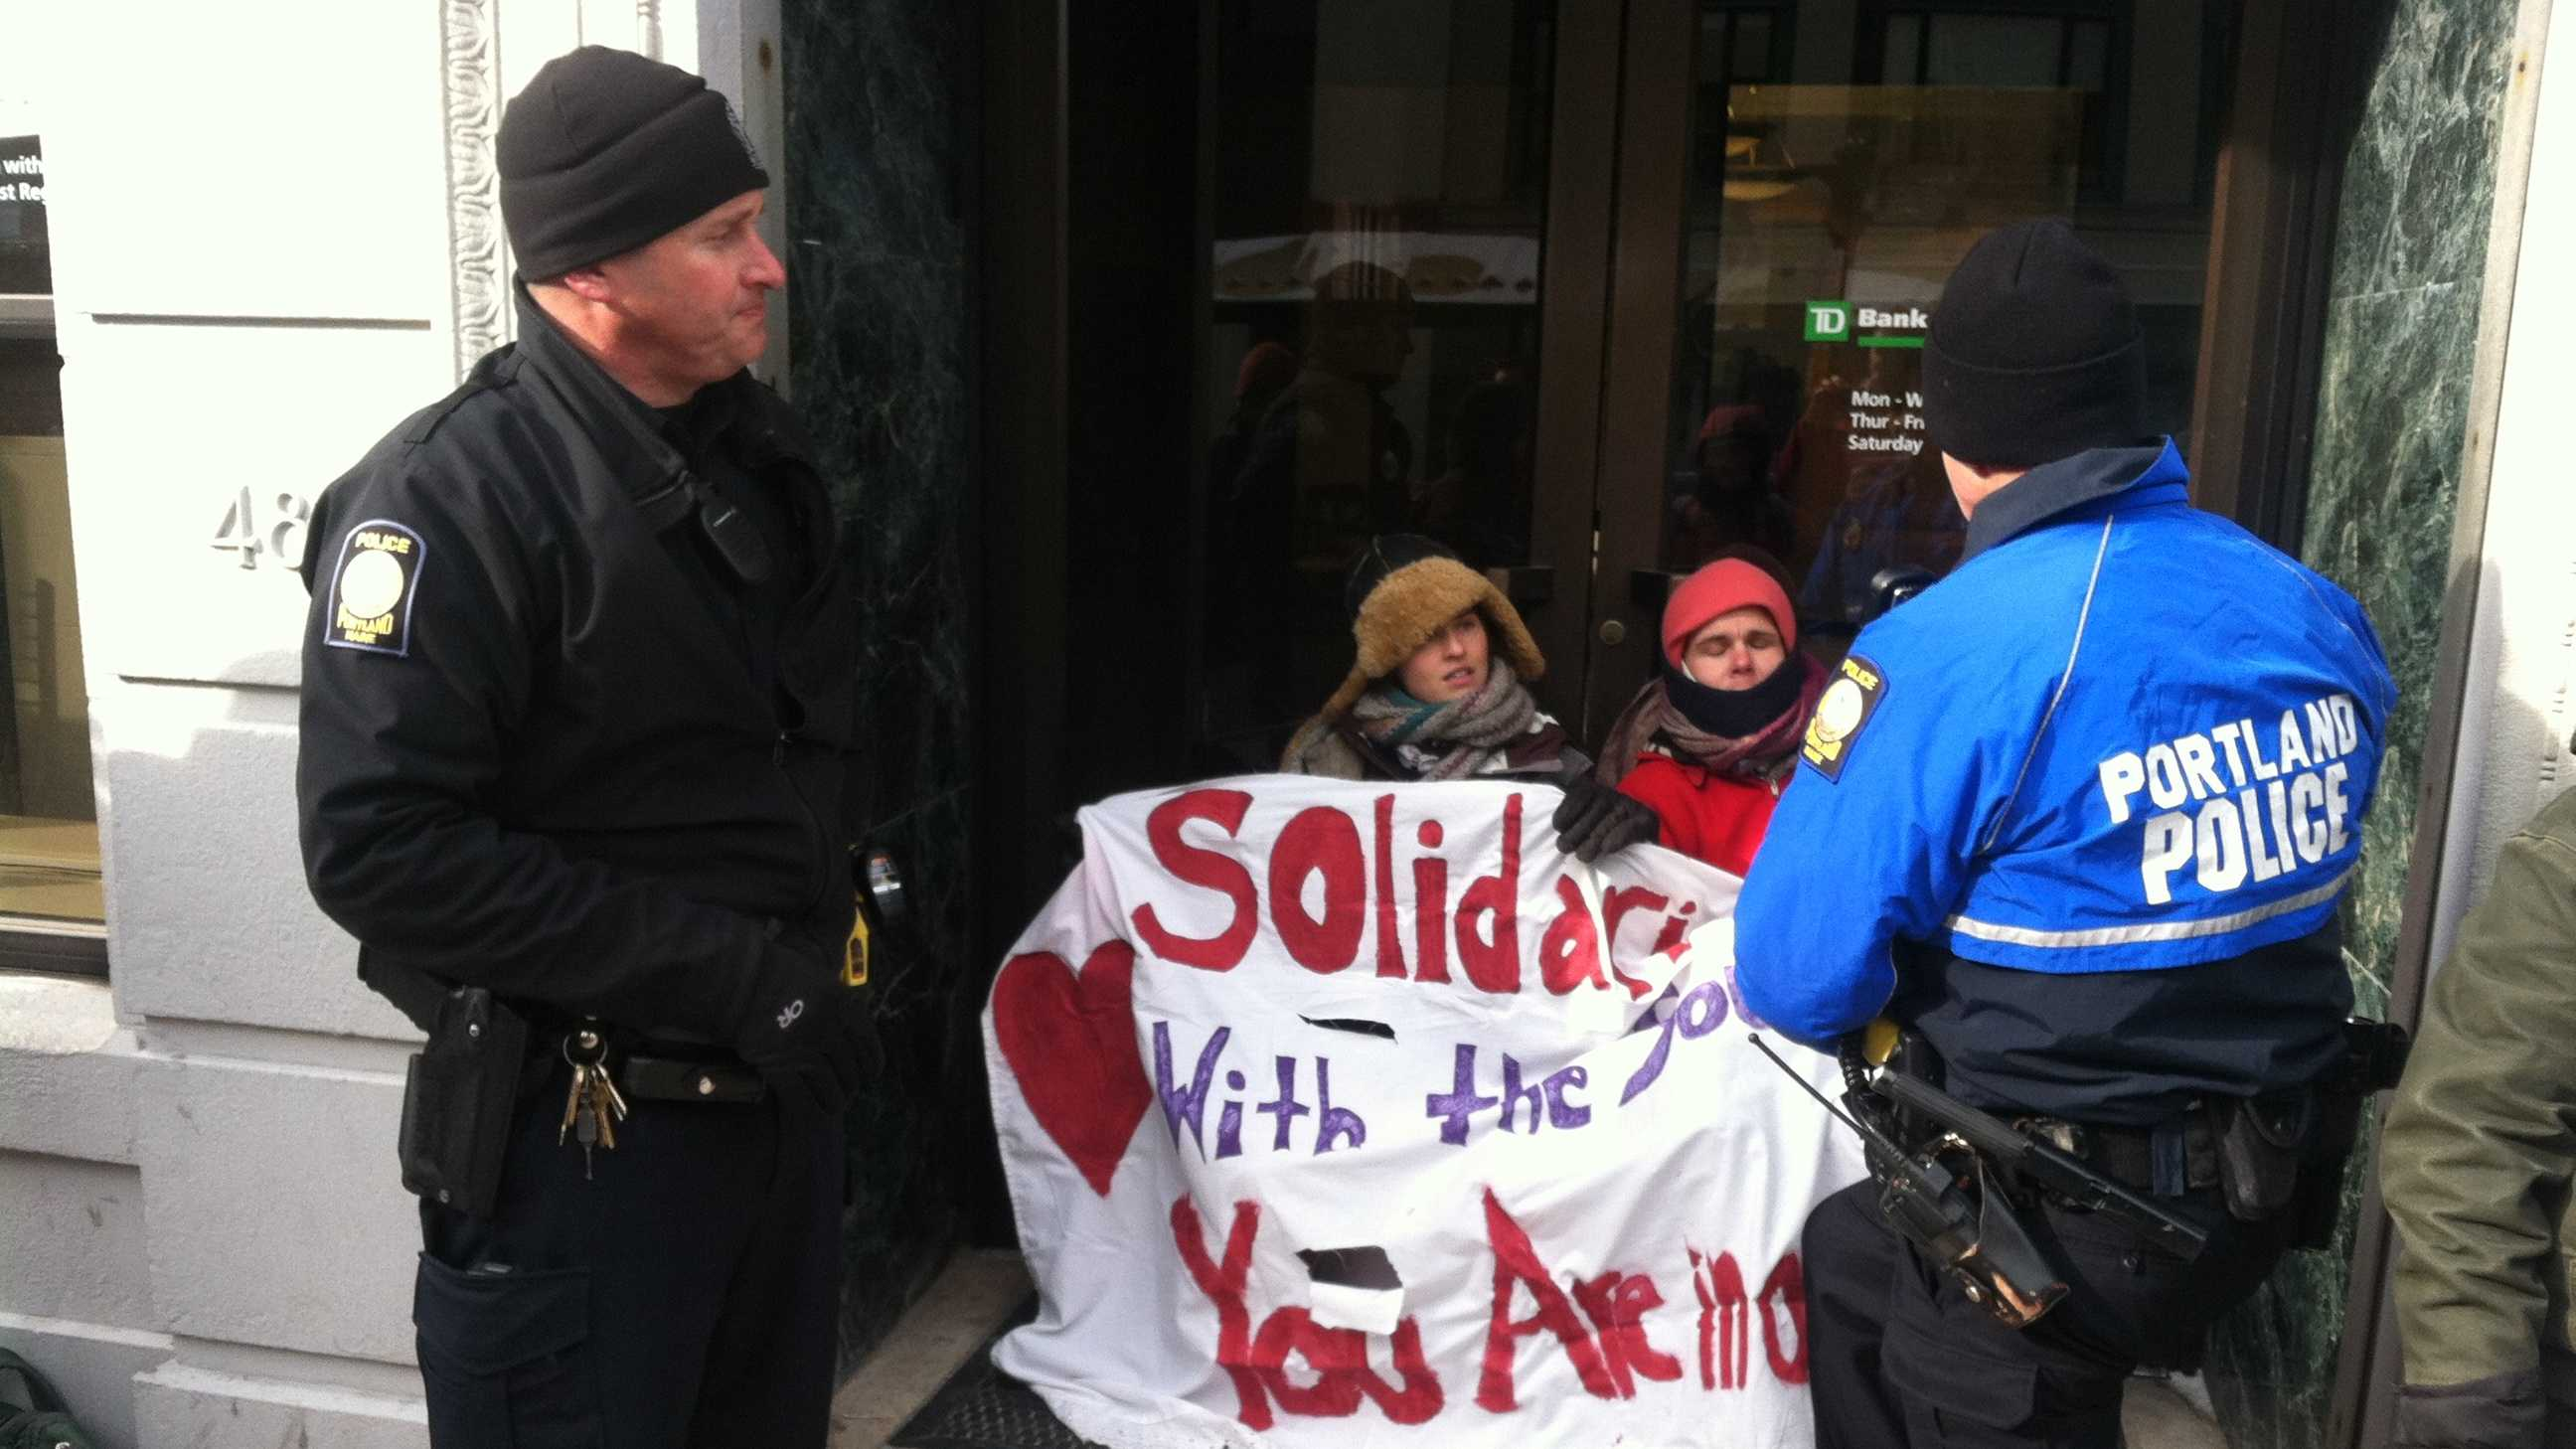 TD Bank Protest Image